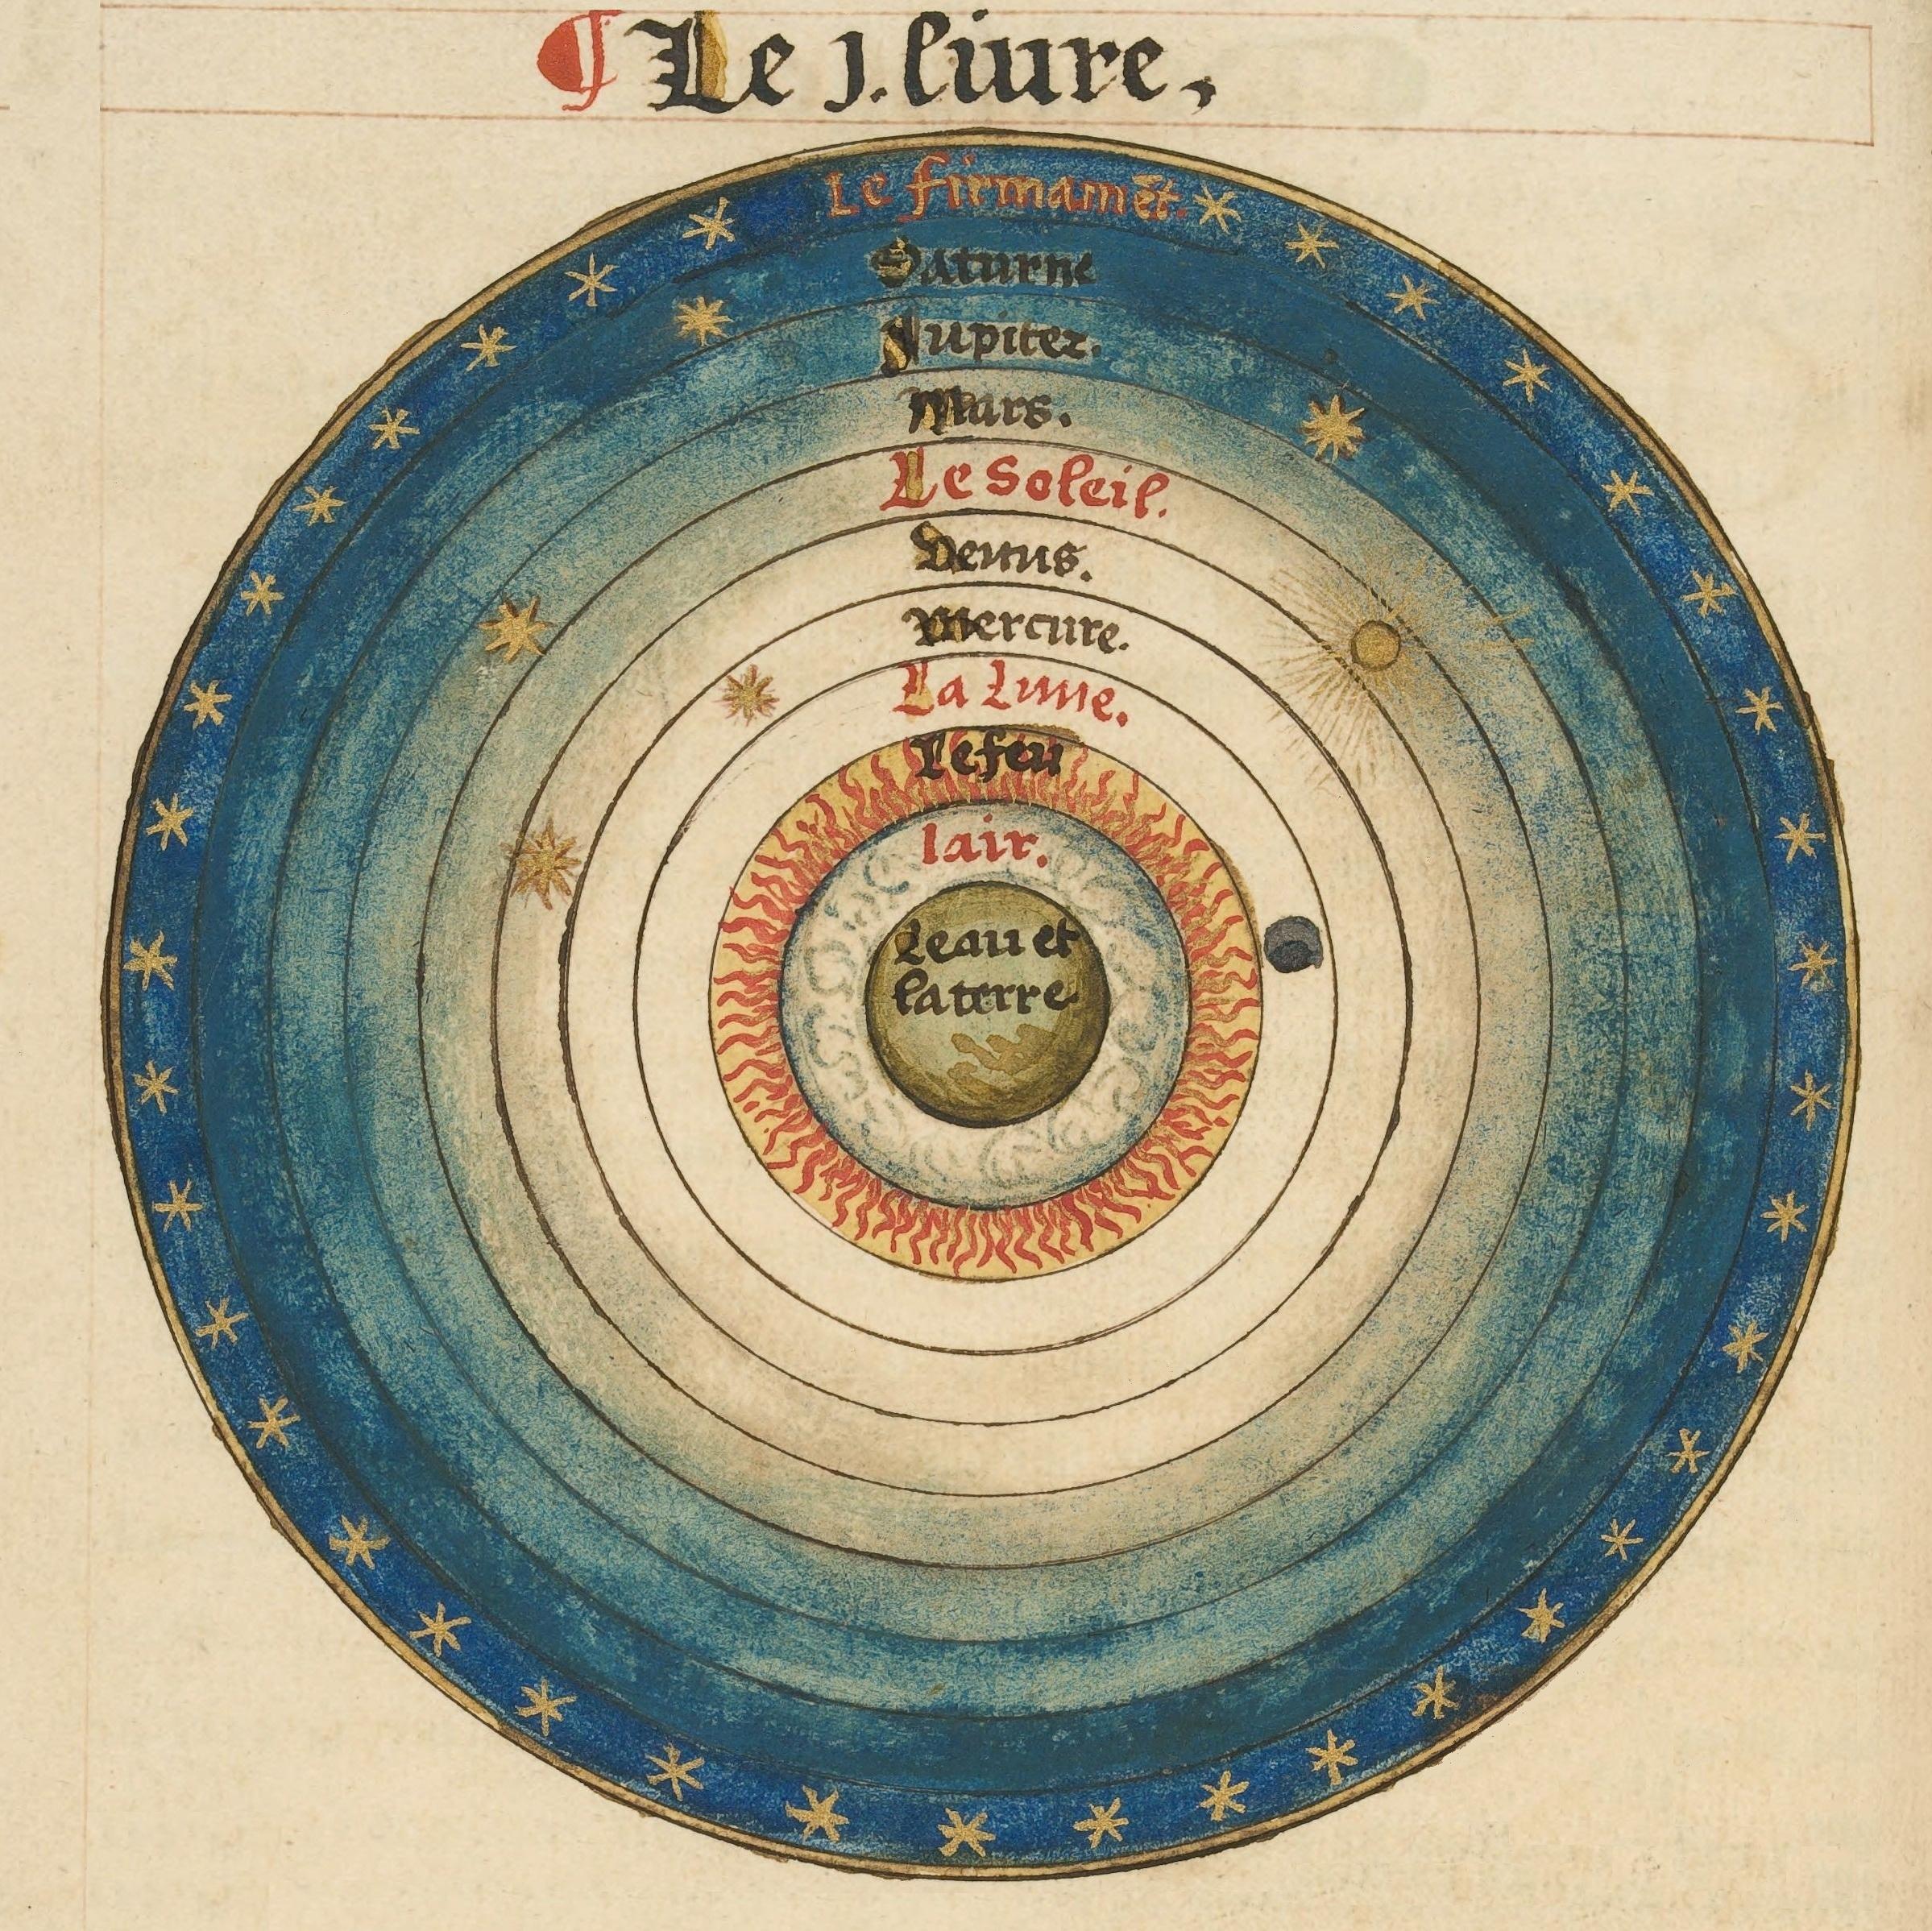 [Image: Geocentricite-terre-centre-univers-carte-02.jpg]